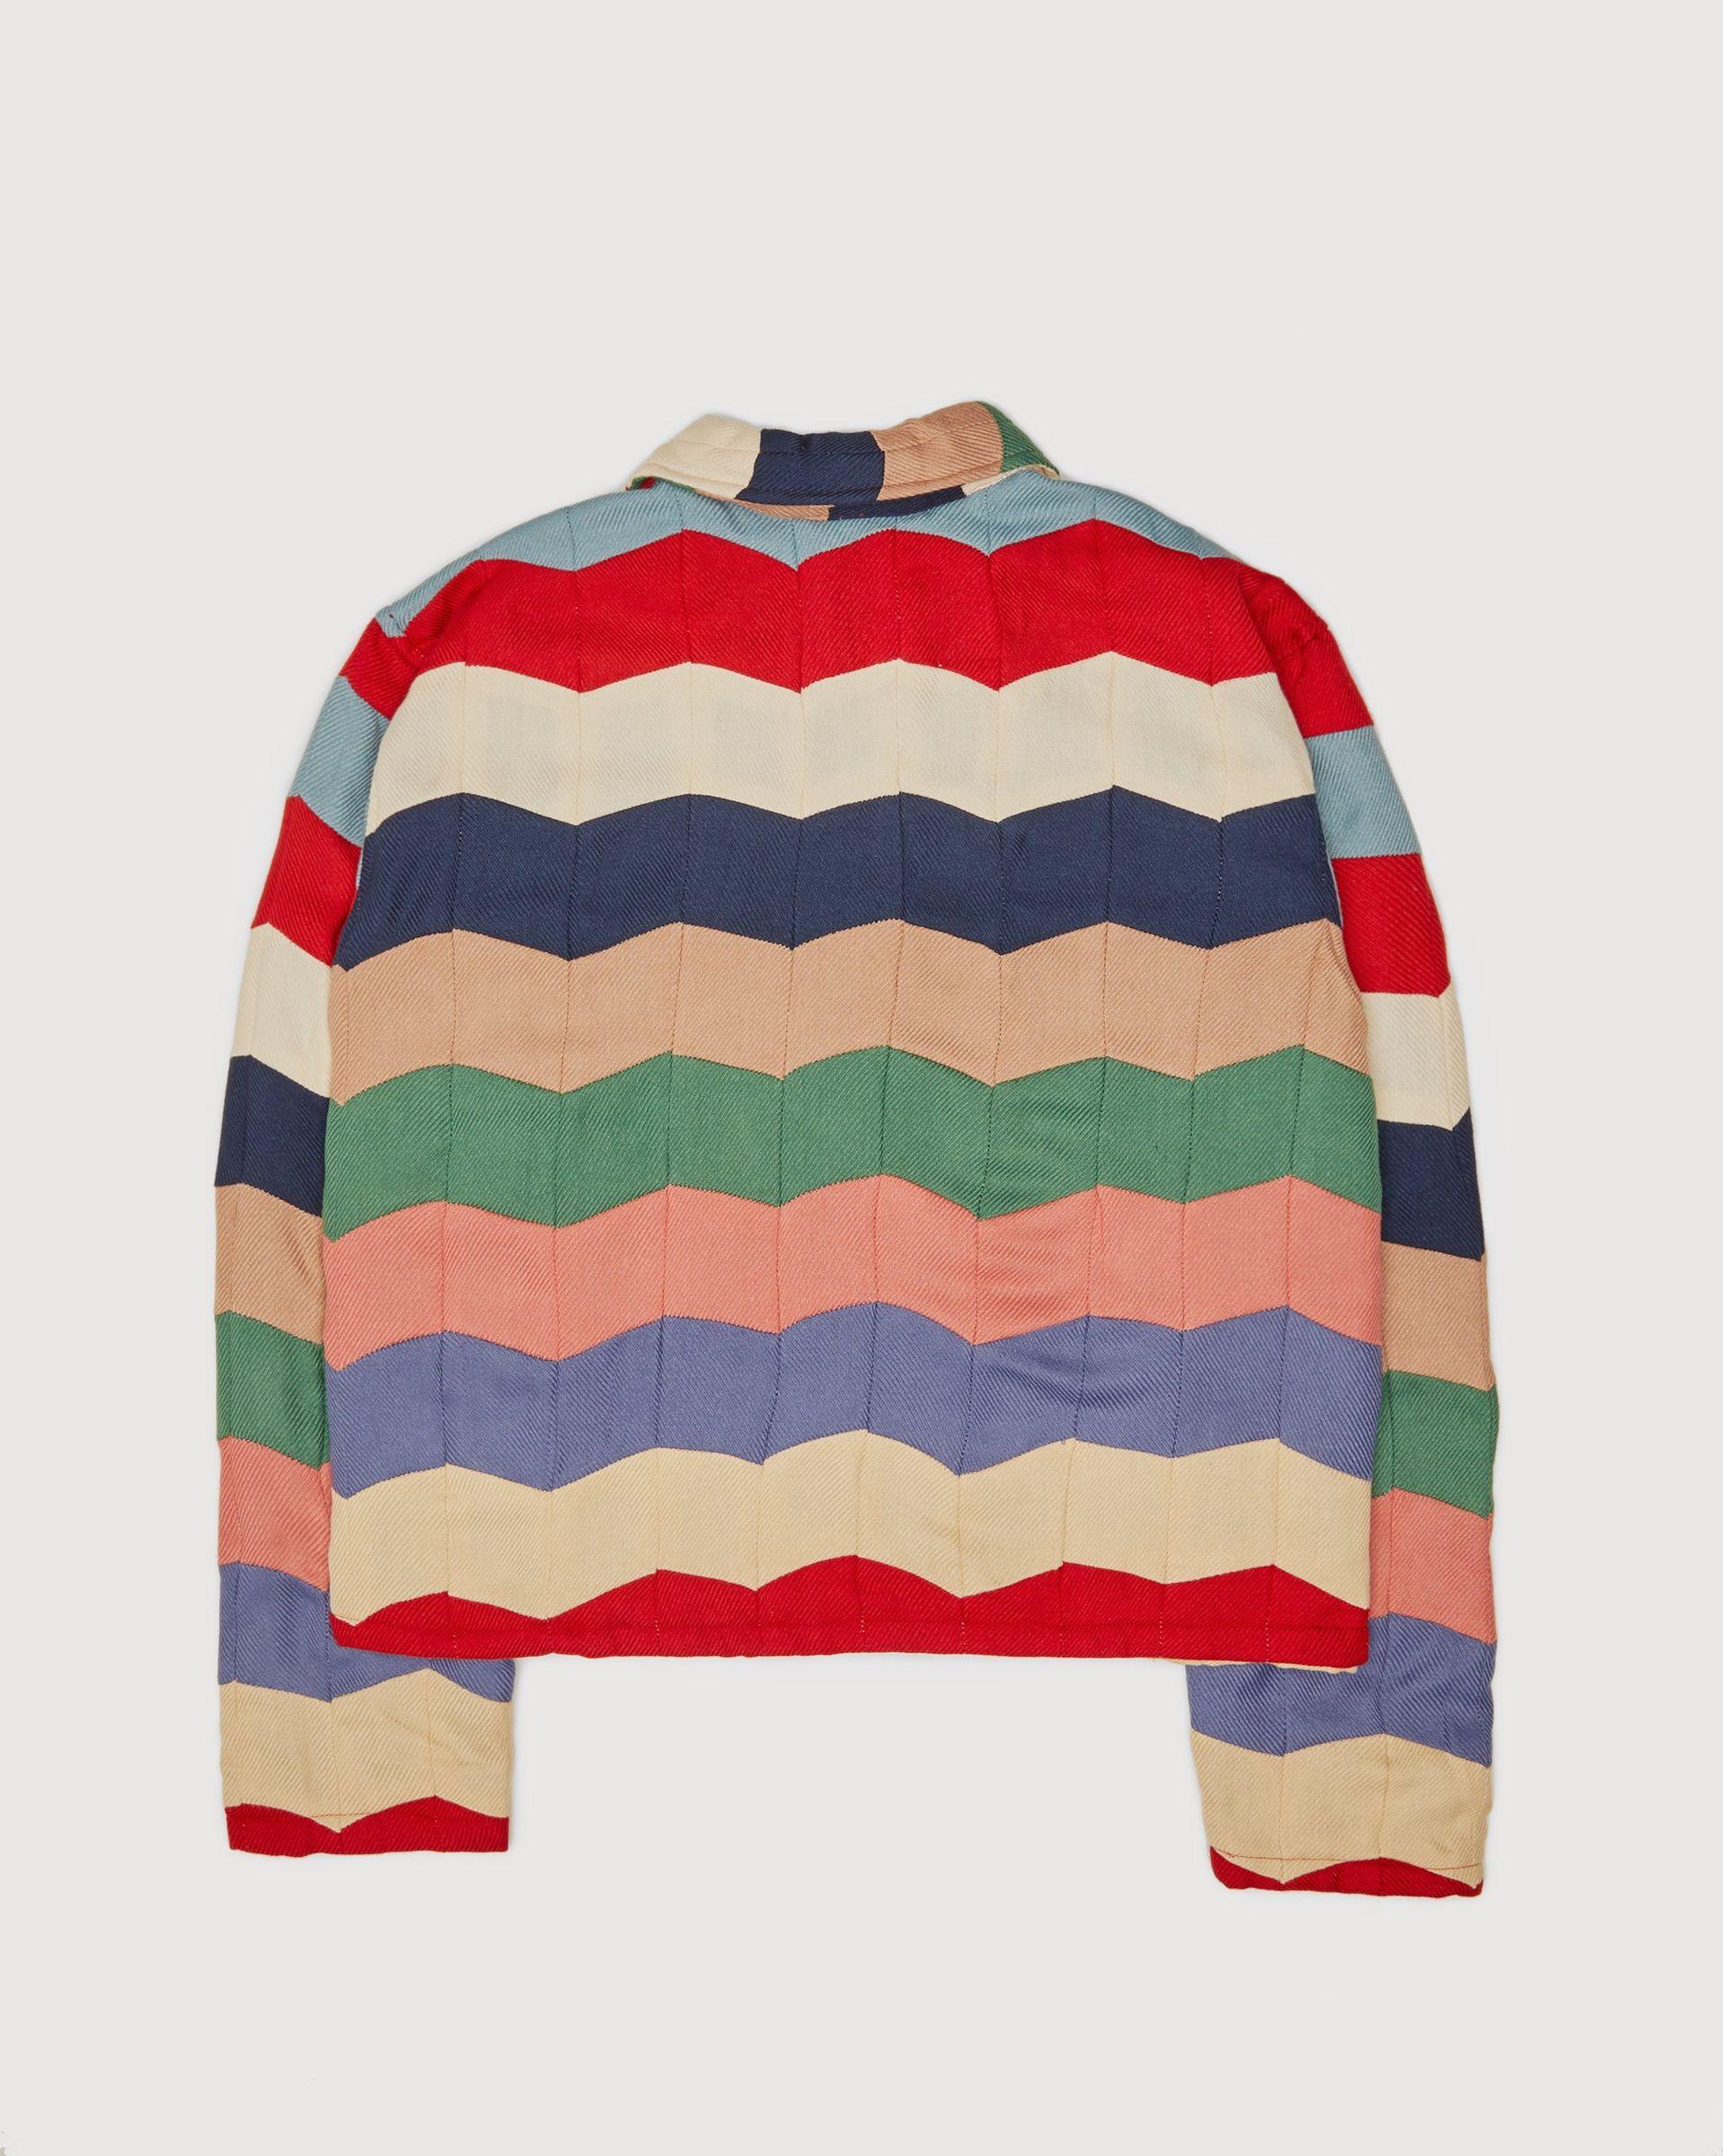 BODE - Chevron Quilt Zip Pullover Multi - Image 2